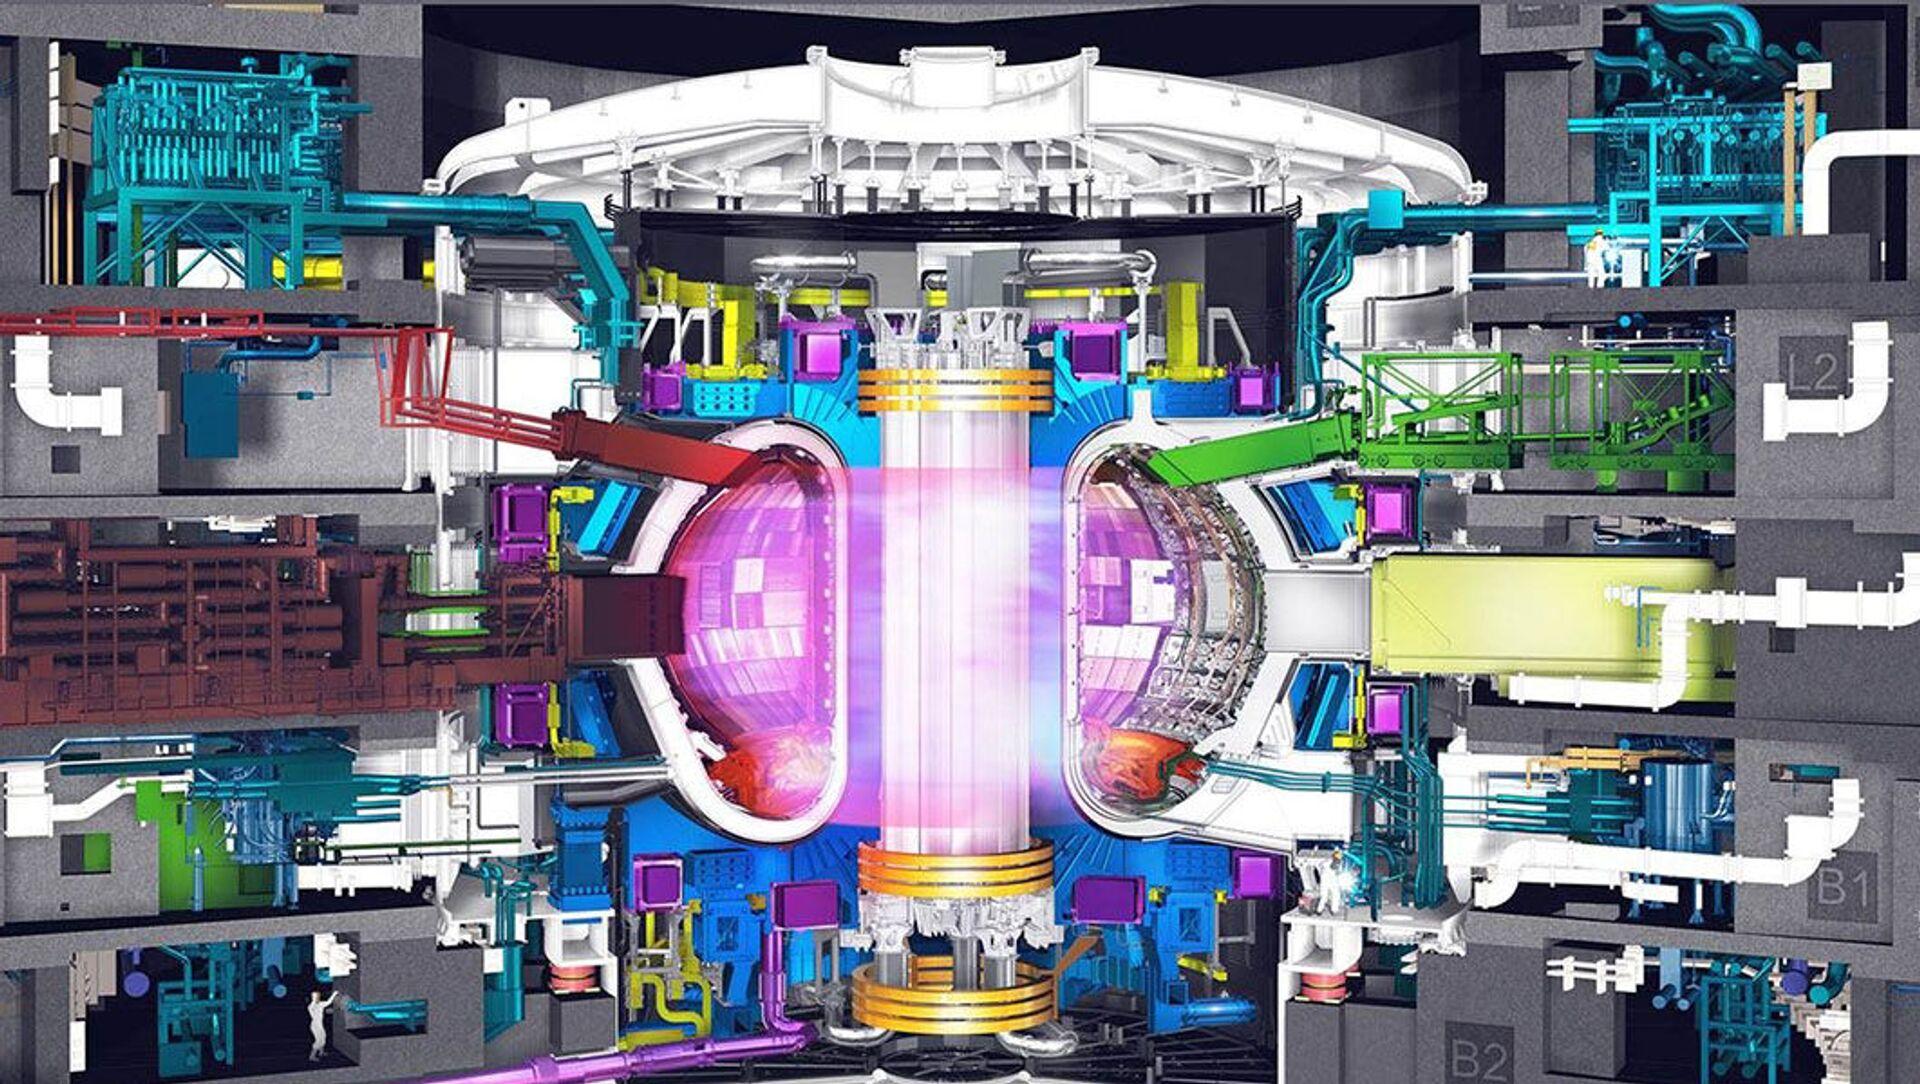 ITER Danieli Telerobot Labs, parte del Danieli Group - Sputnik Italia, 1920, 04.02.2021